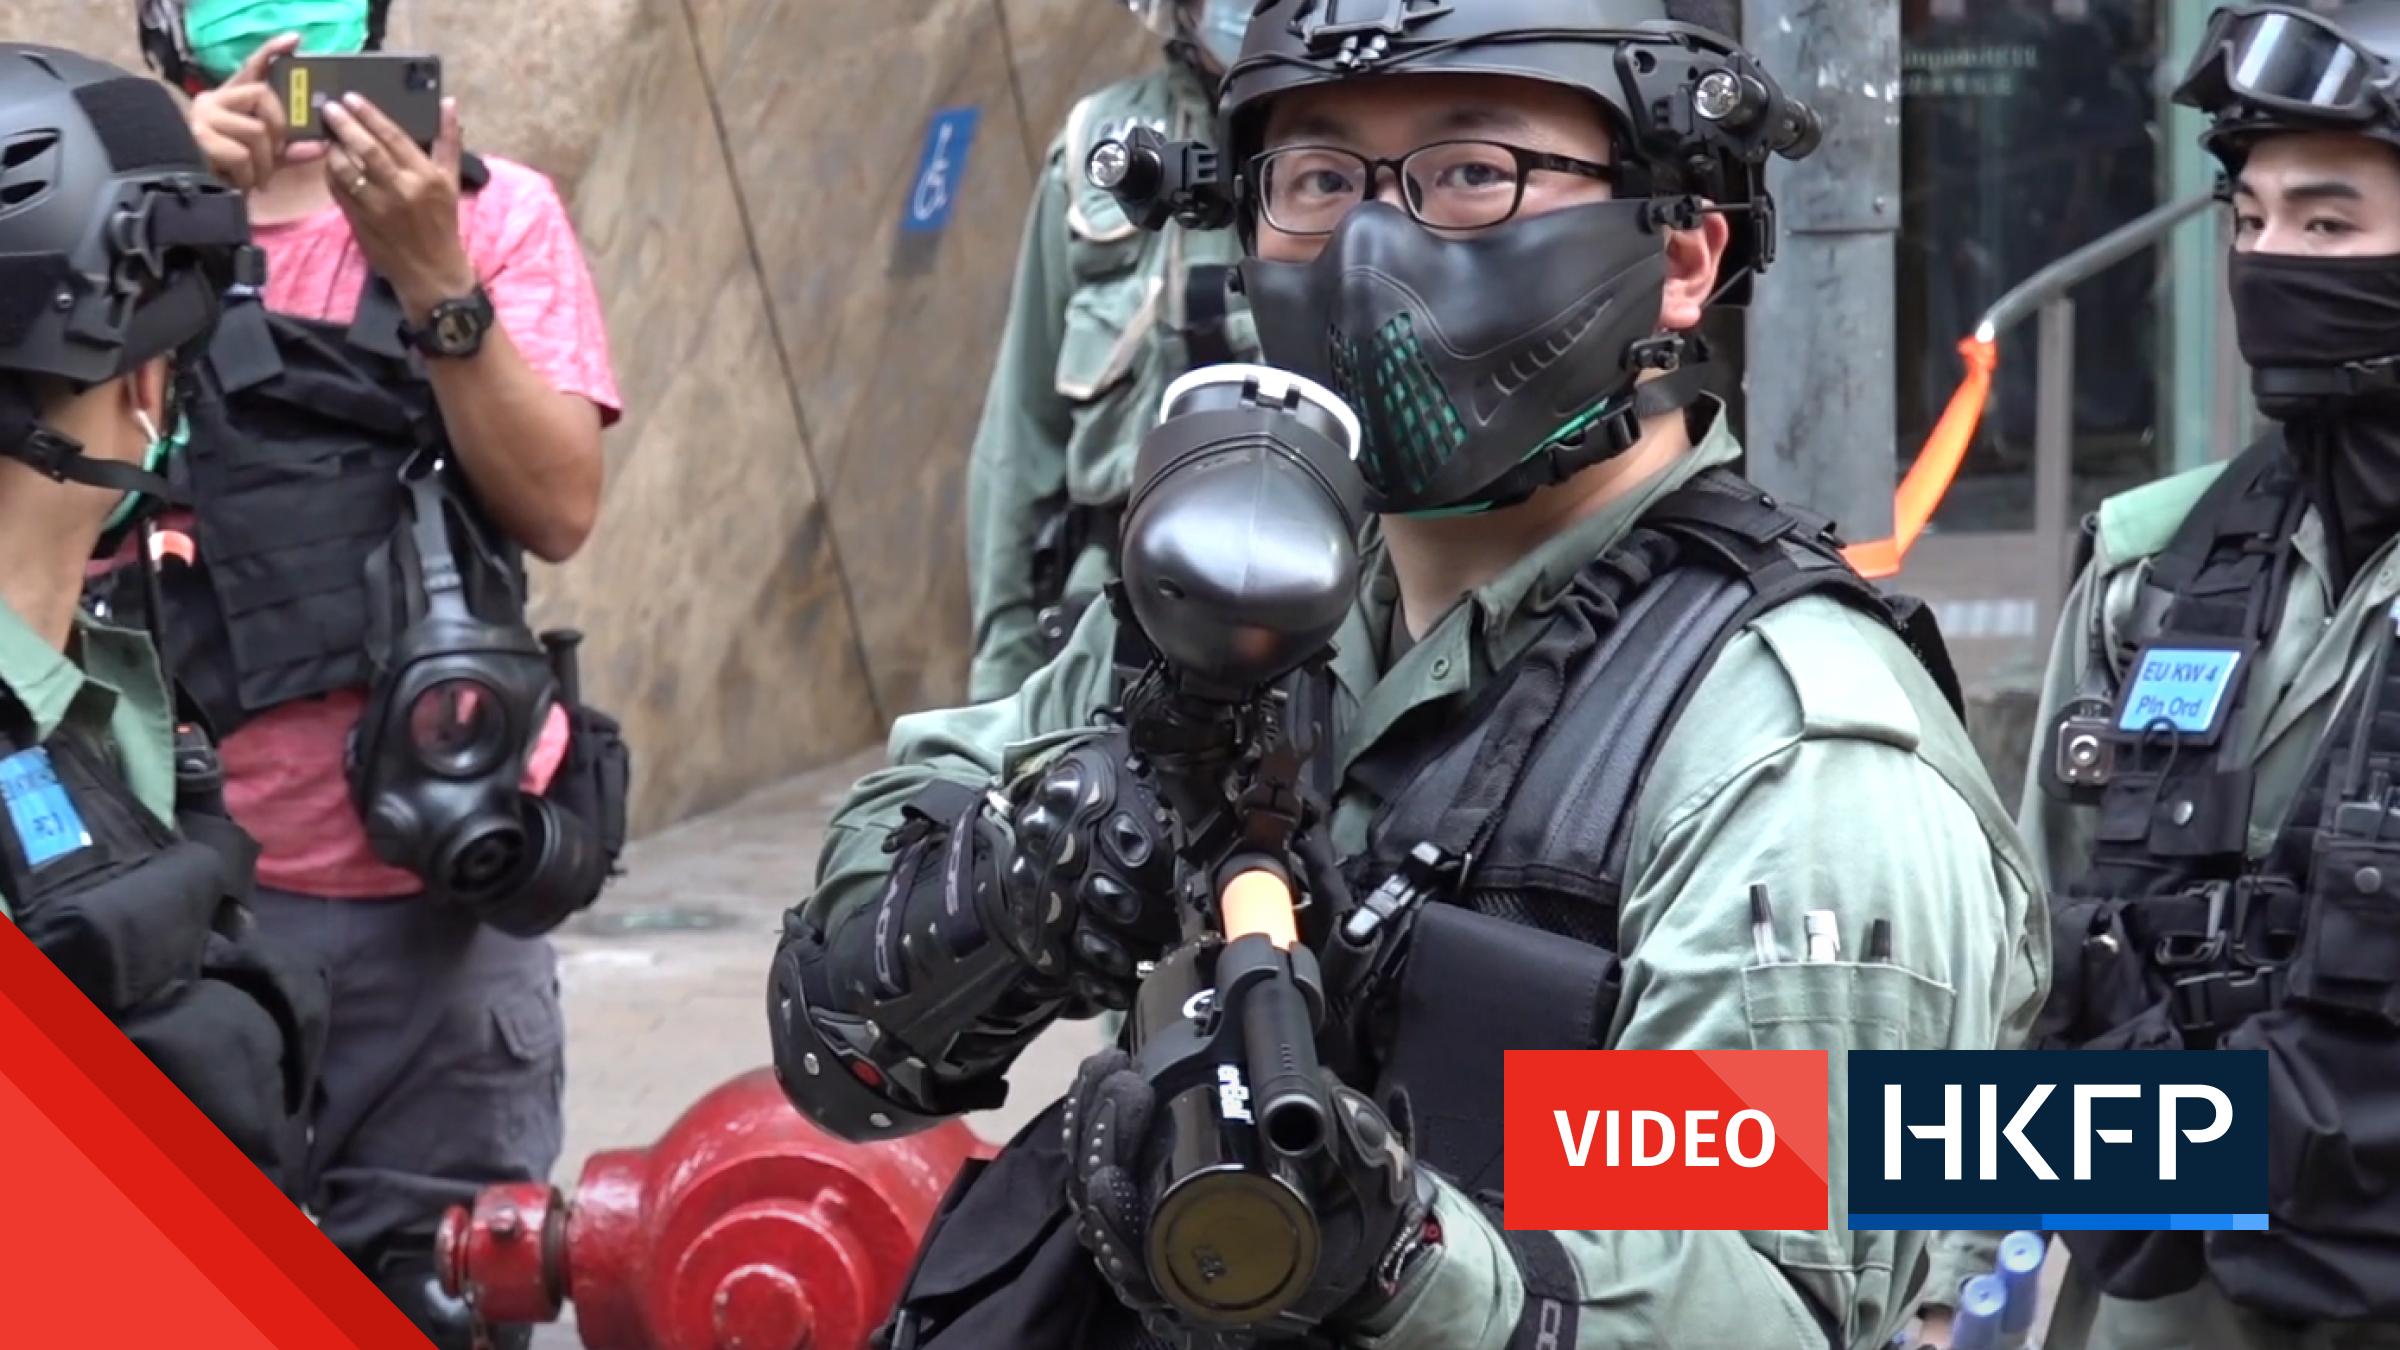 ryan lai video hong kong arrests